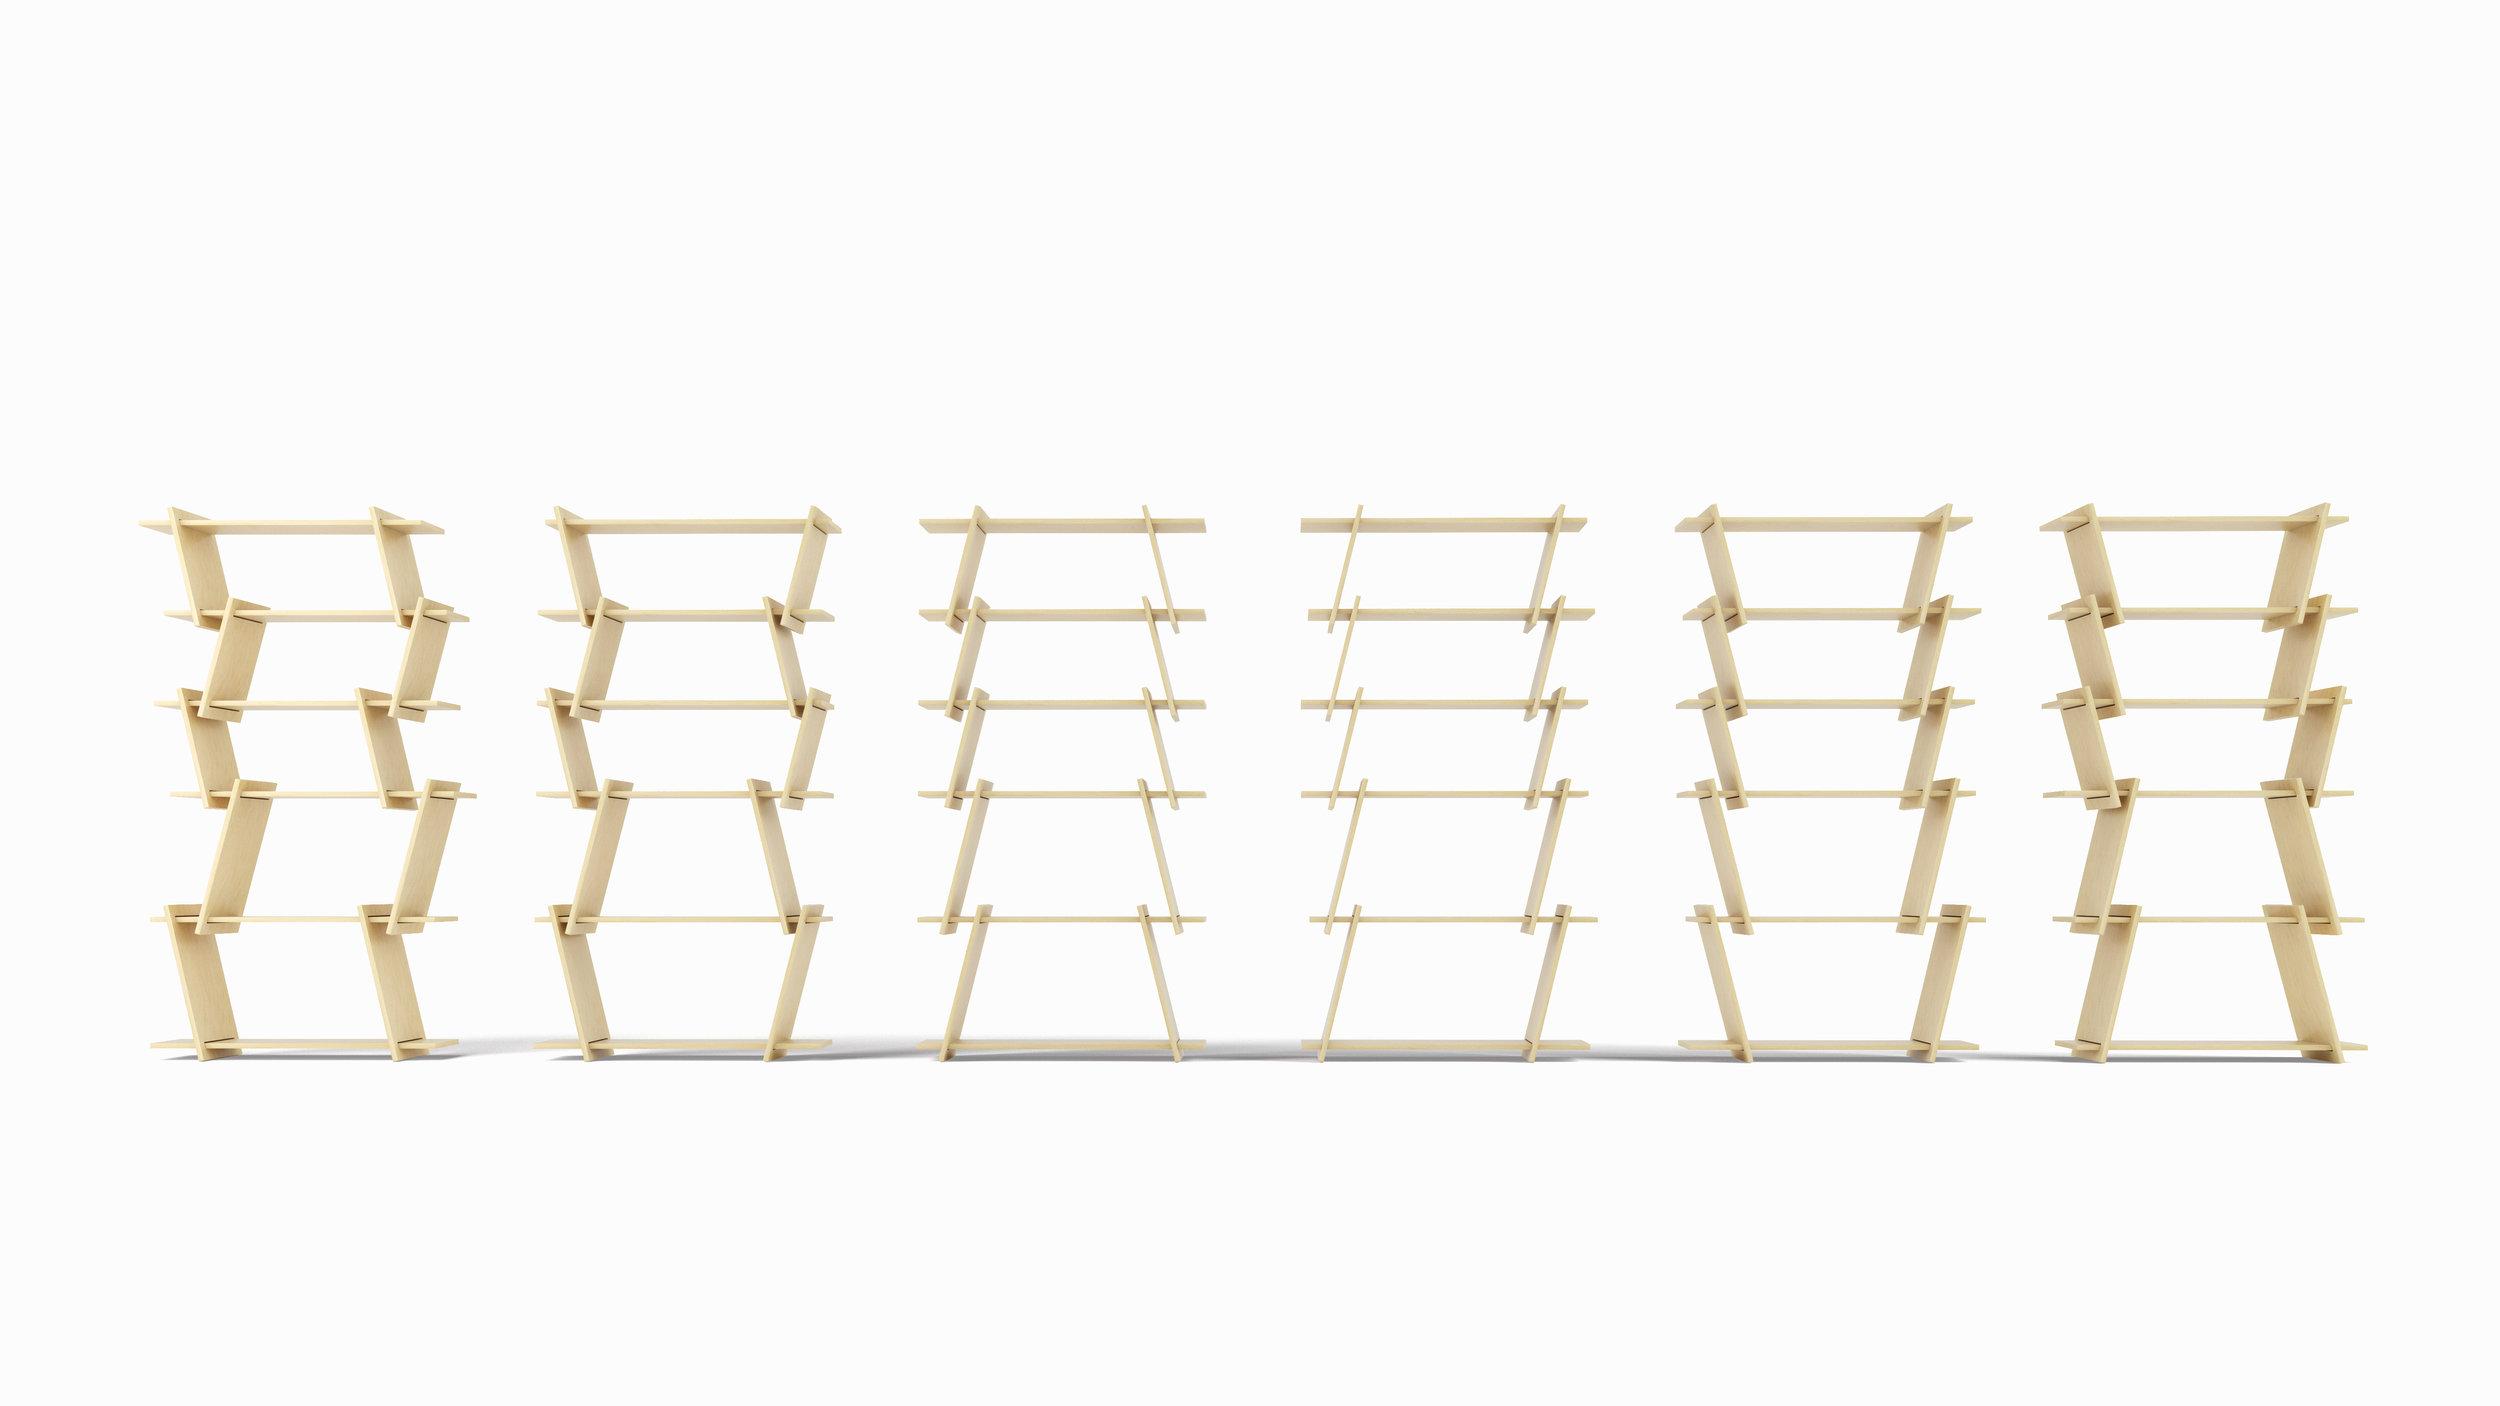 FIT_Furniture-Italic_Narrow_Shelf_options-Ronen_Kadushin